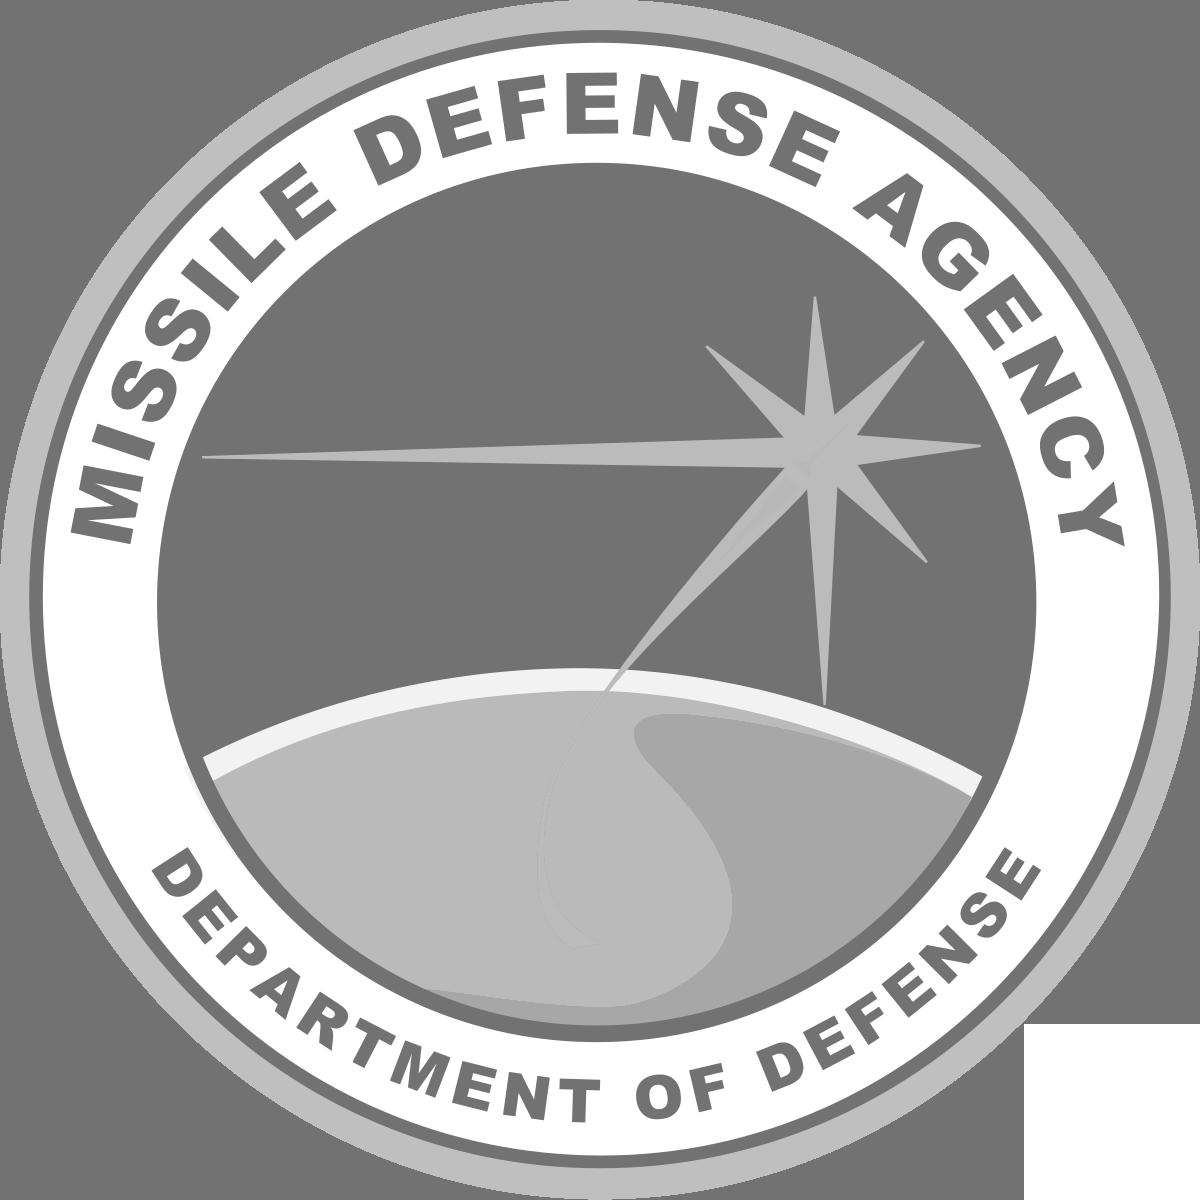 Missile Defense Agency seal